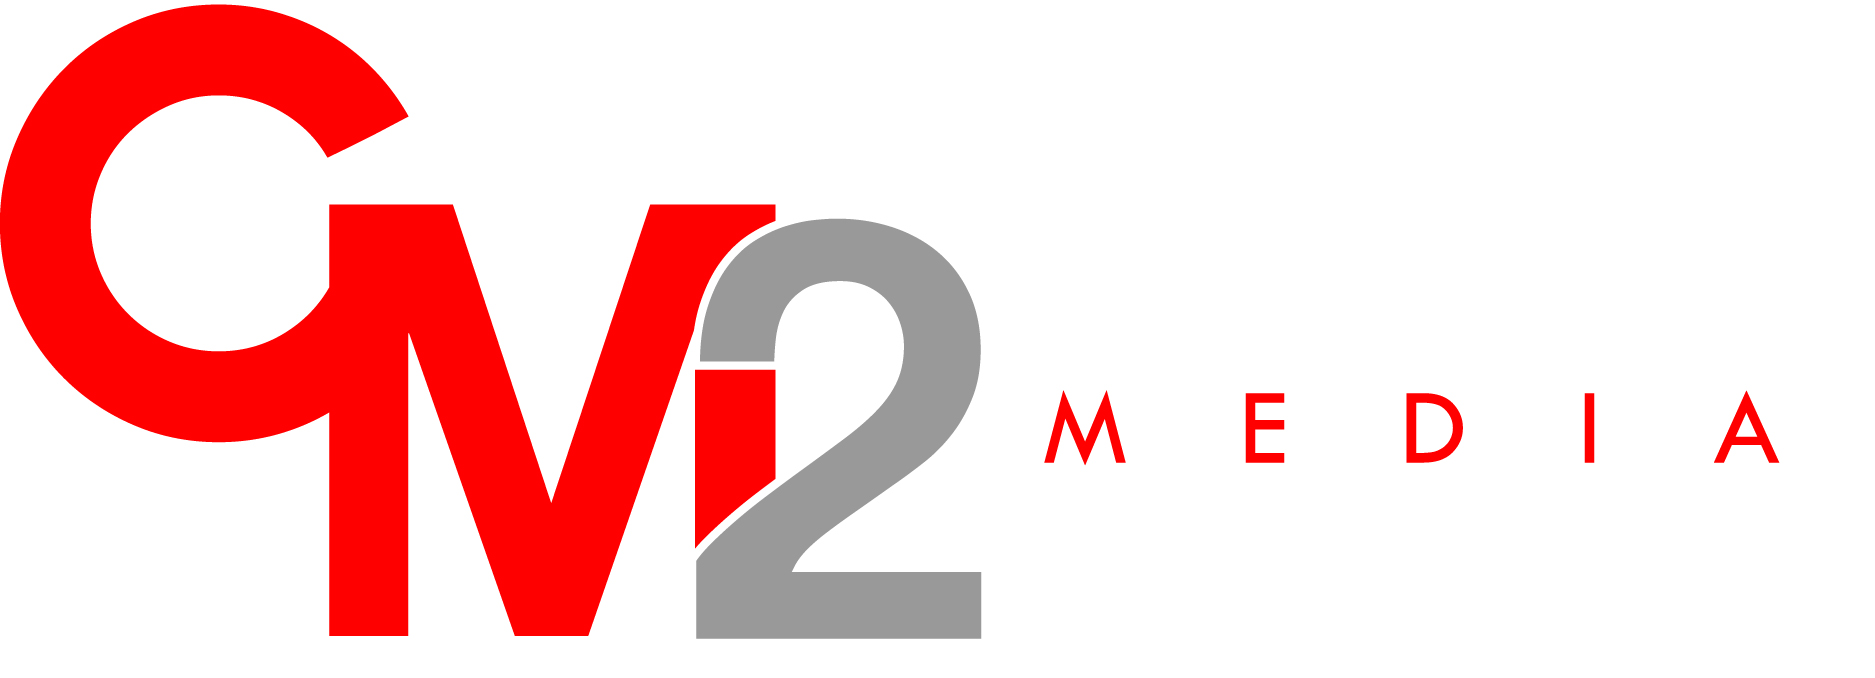 Cm2 Media oakville burlington website desing